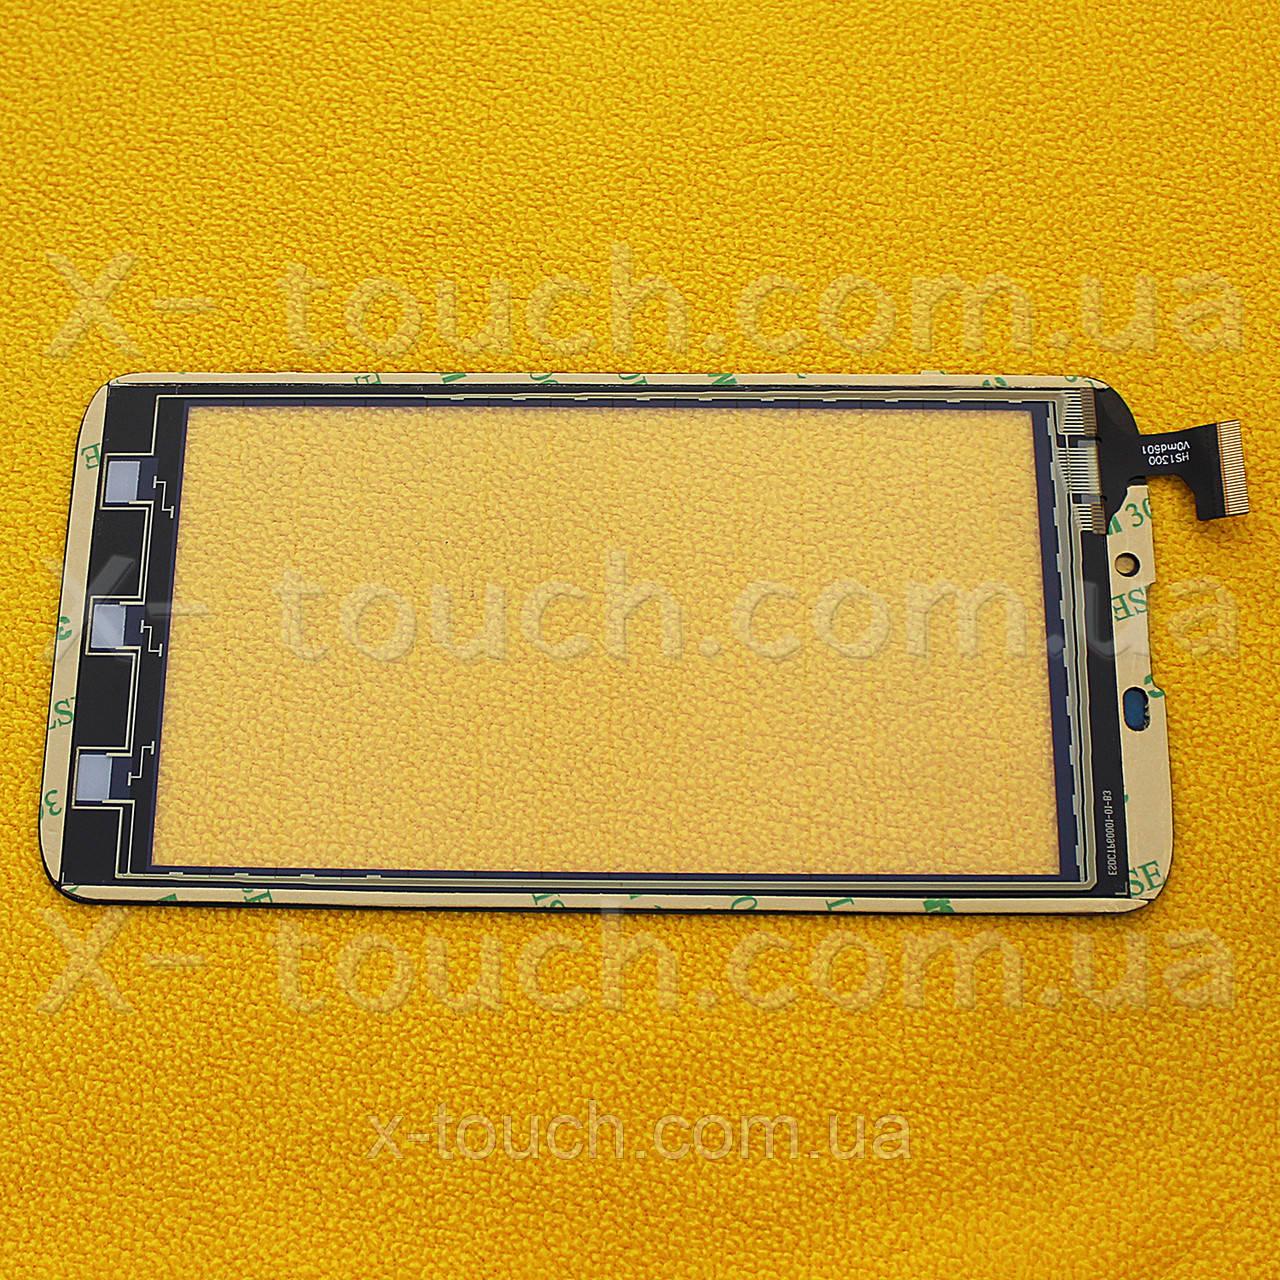 Тачскрин, сенсор  HS1300 V0md601 для планшета